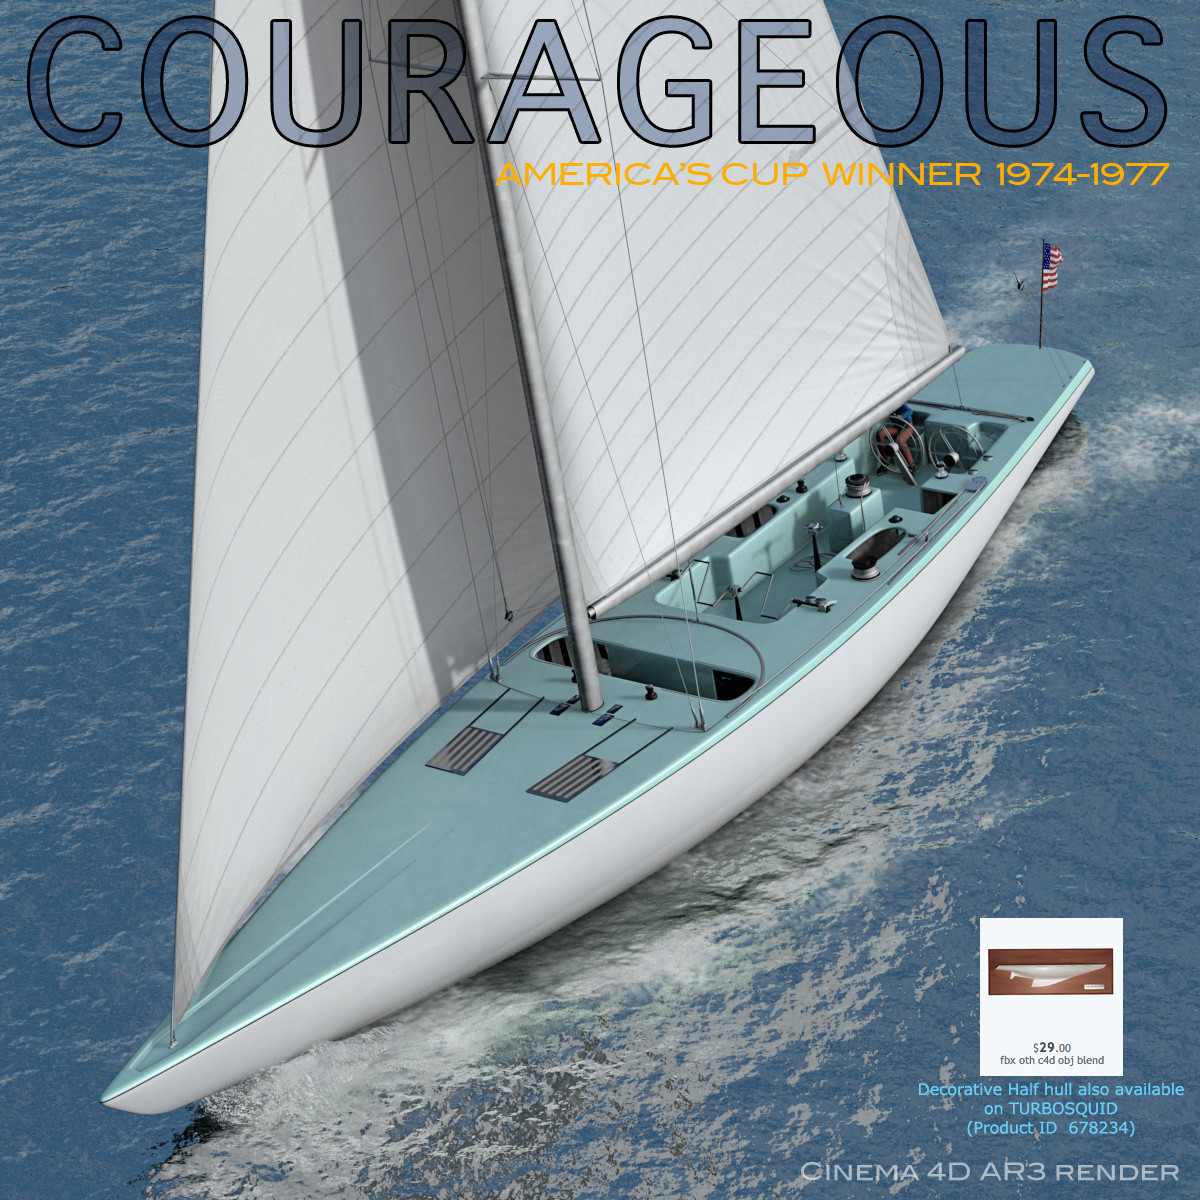 Courageous2.jpg